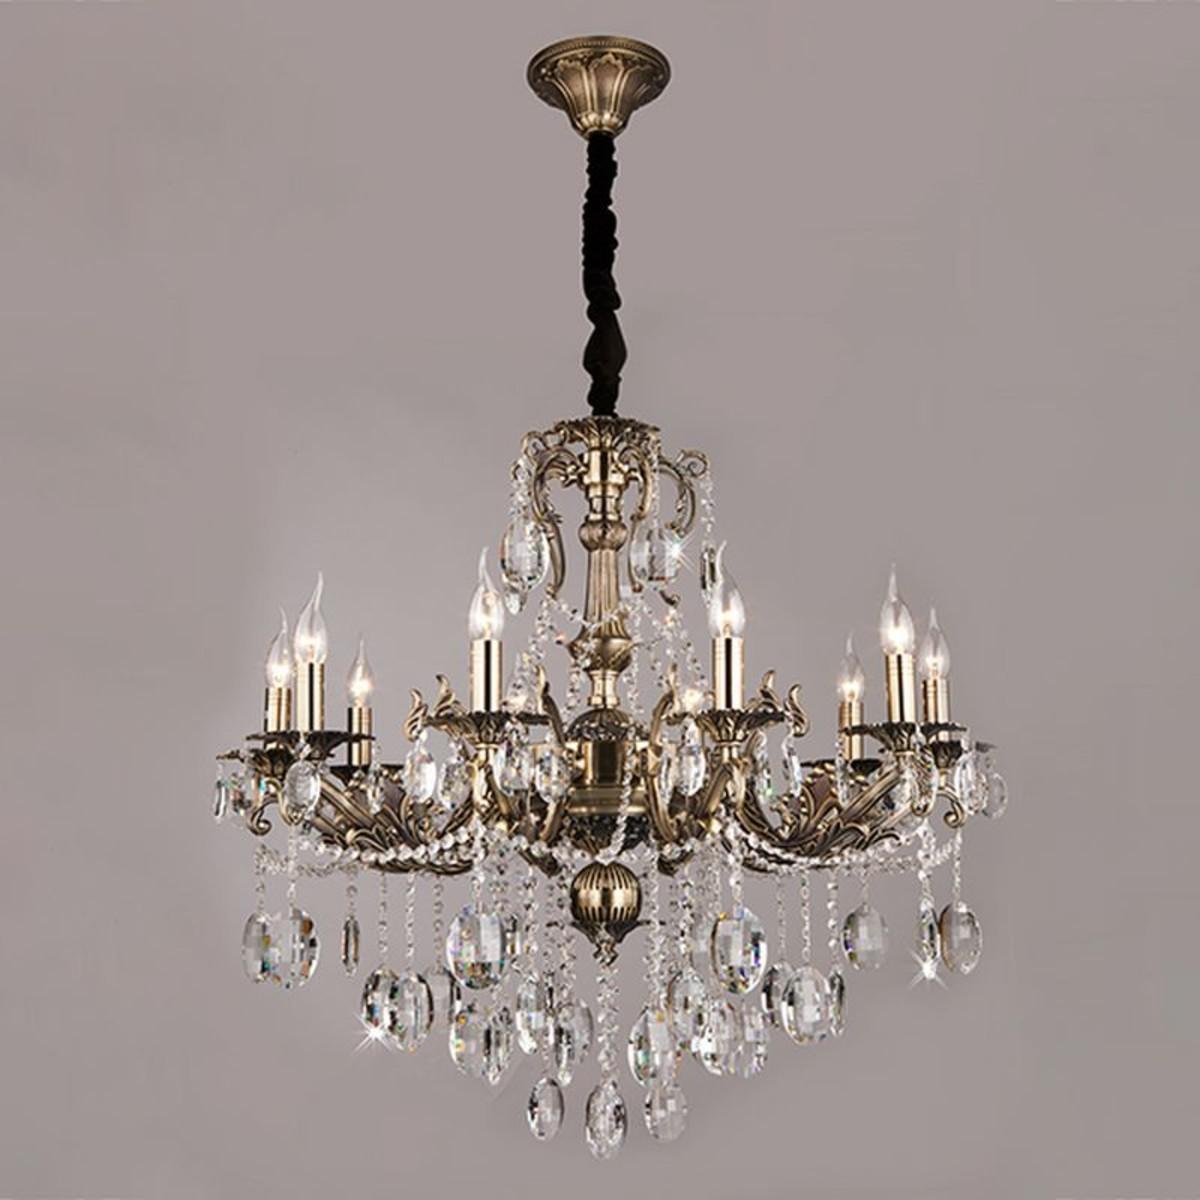 Люстра подвесная Bogate's Fedelia E14 406/10 Strotskis 10 ламп 48 м²